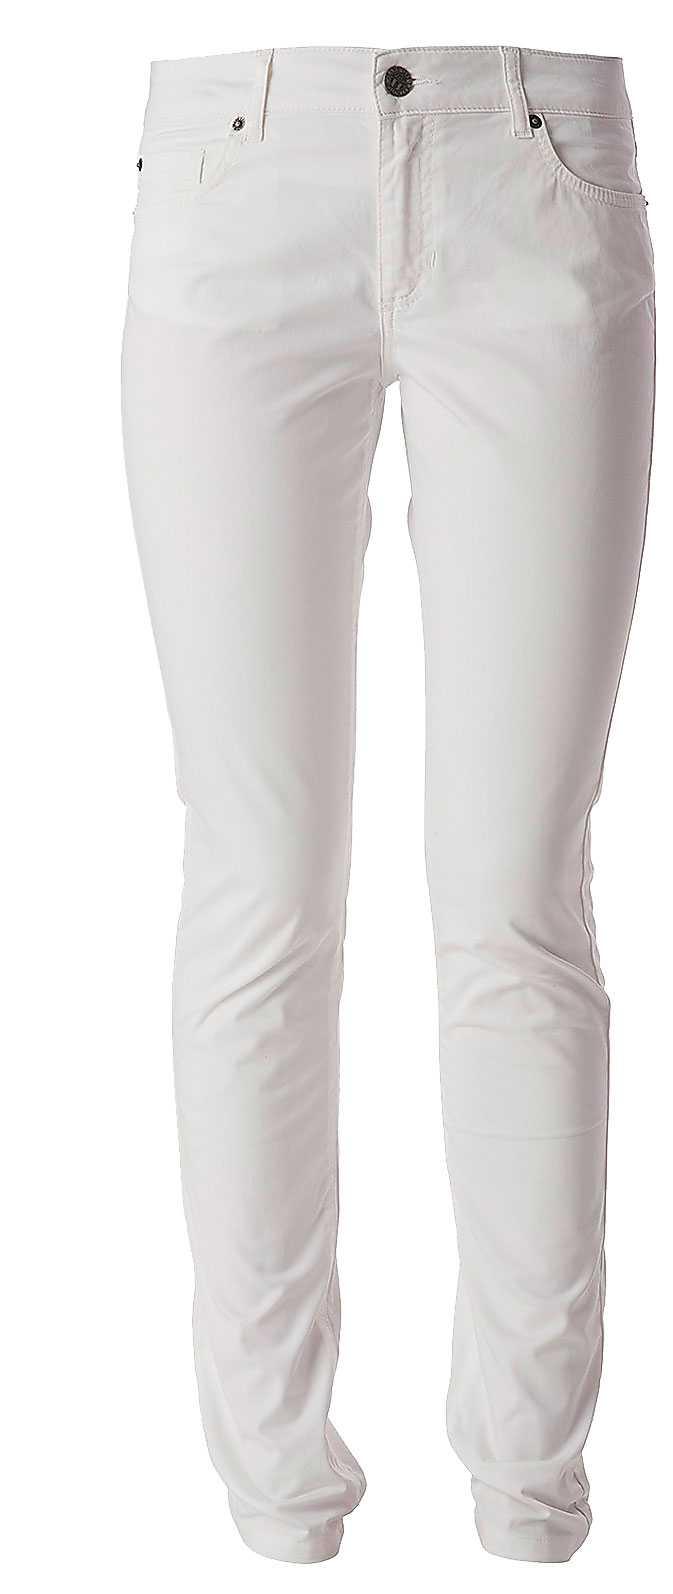 lexington Clothing 1295 kr